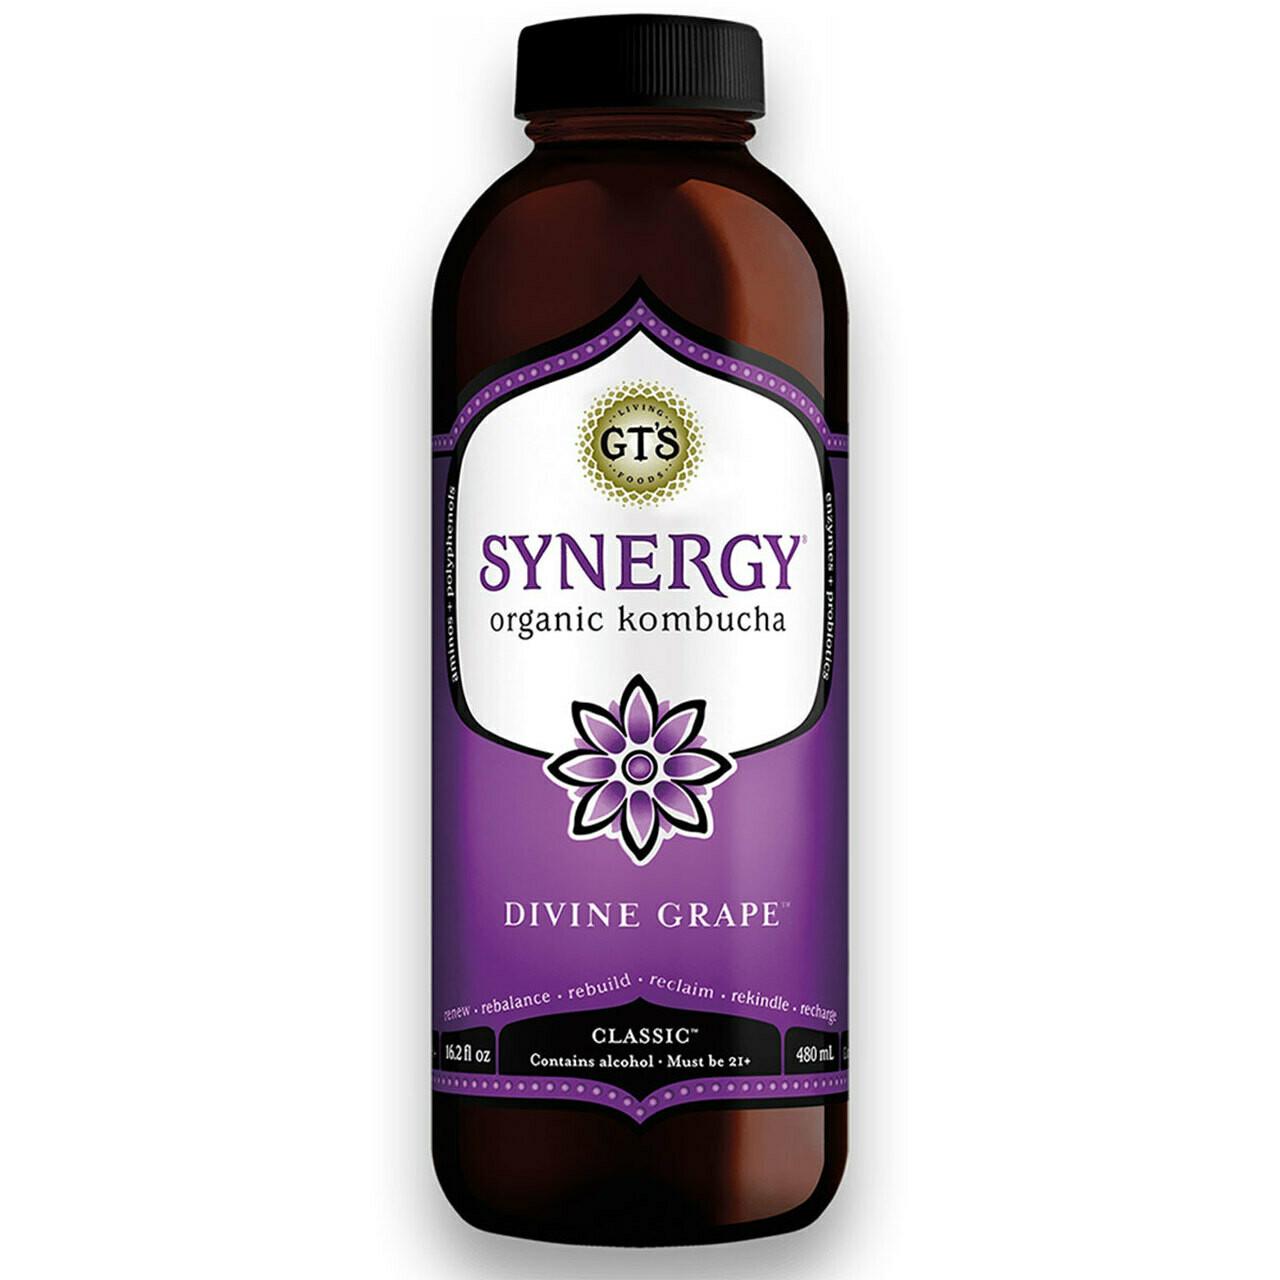 GT's Synergy Divine Grape 2% Alc. Kombucha 16oz.